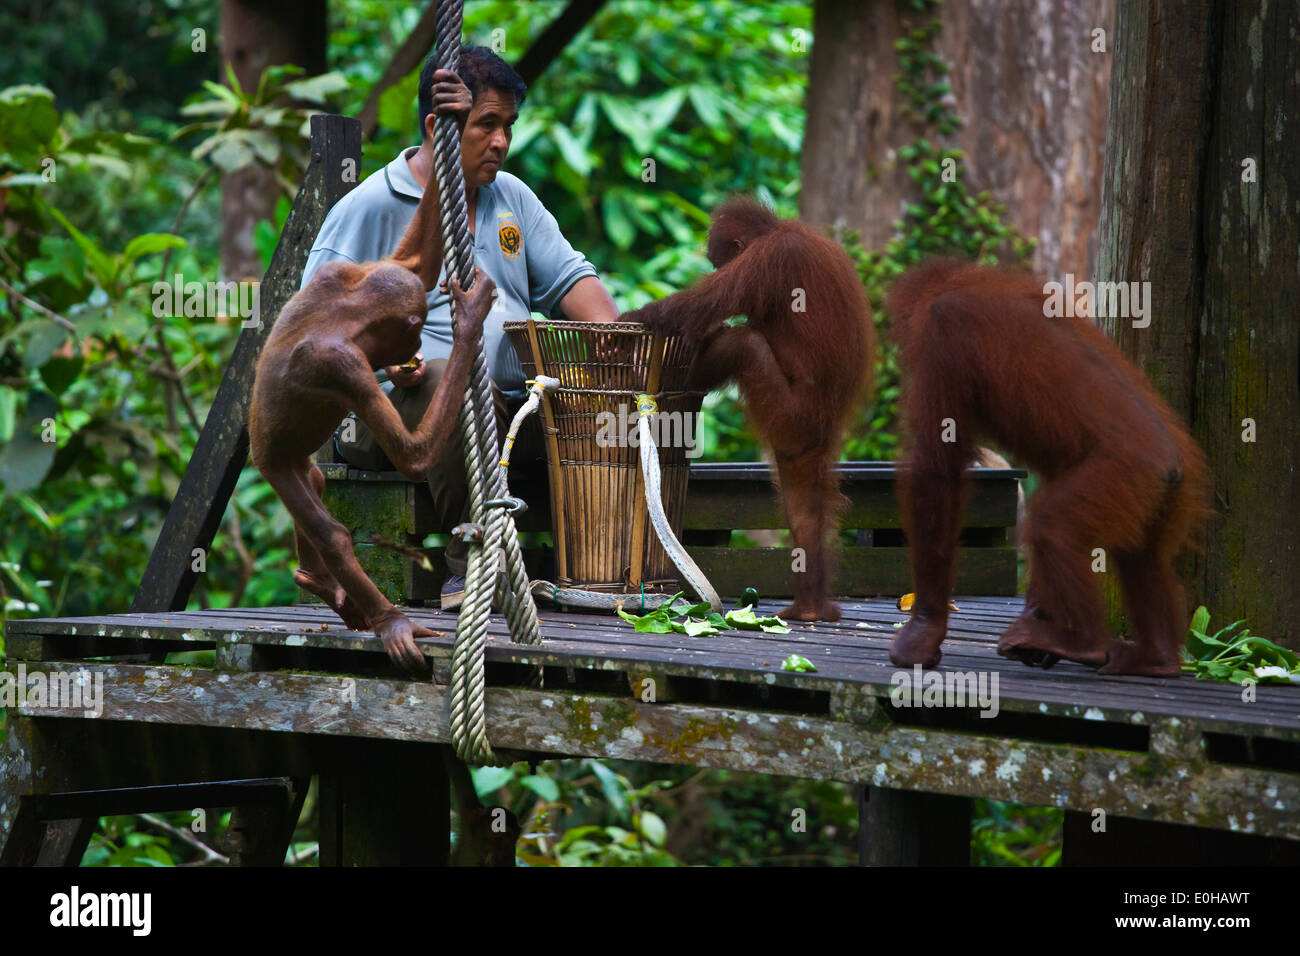 Orangutans are fed at the Sepilok Orangutan Rehabilitation Center in the Kabili Sepilok Forest -  BORNEO Stock Photo